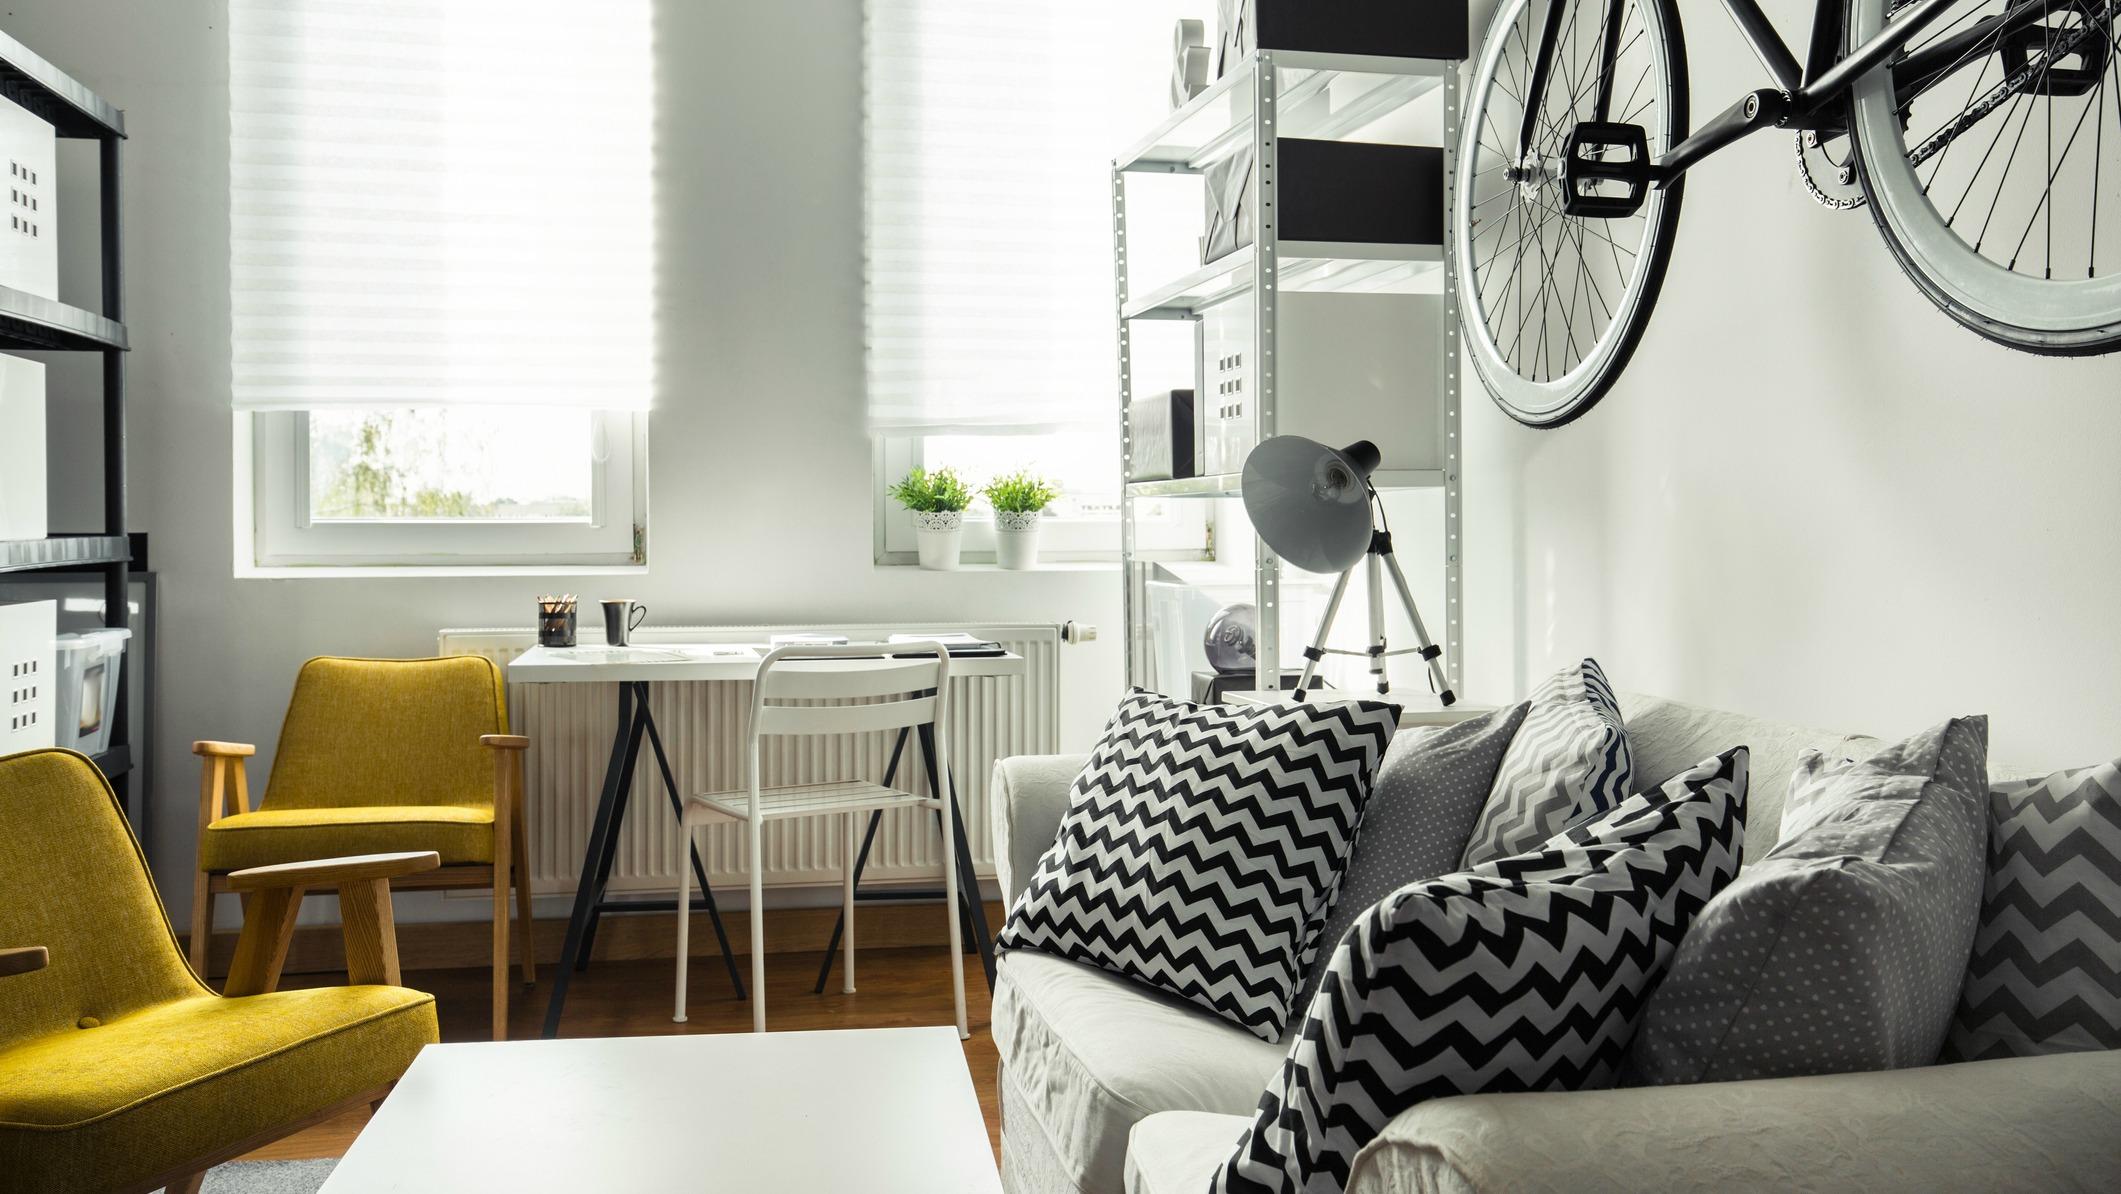 1 Drapes Simphome 20 Easy Interior Design Ideas for Small Apartments